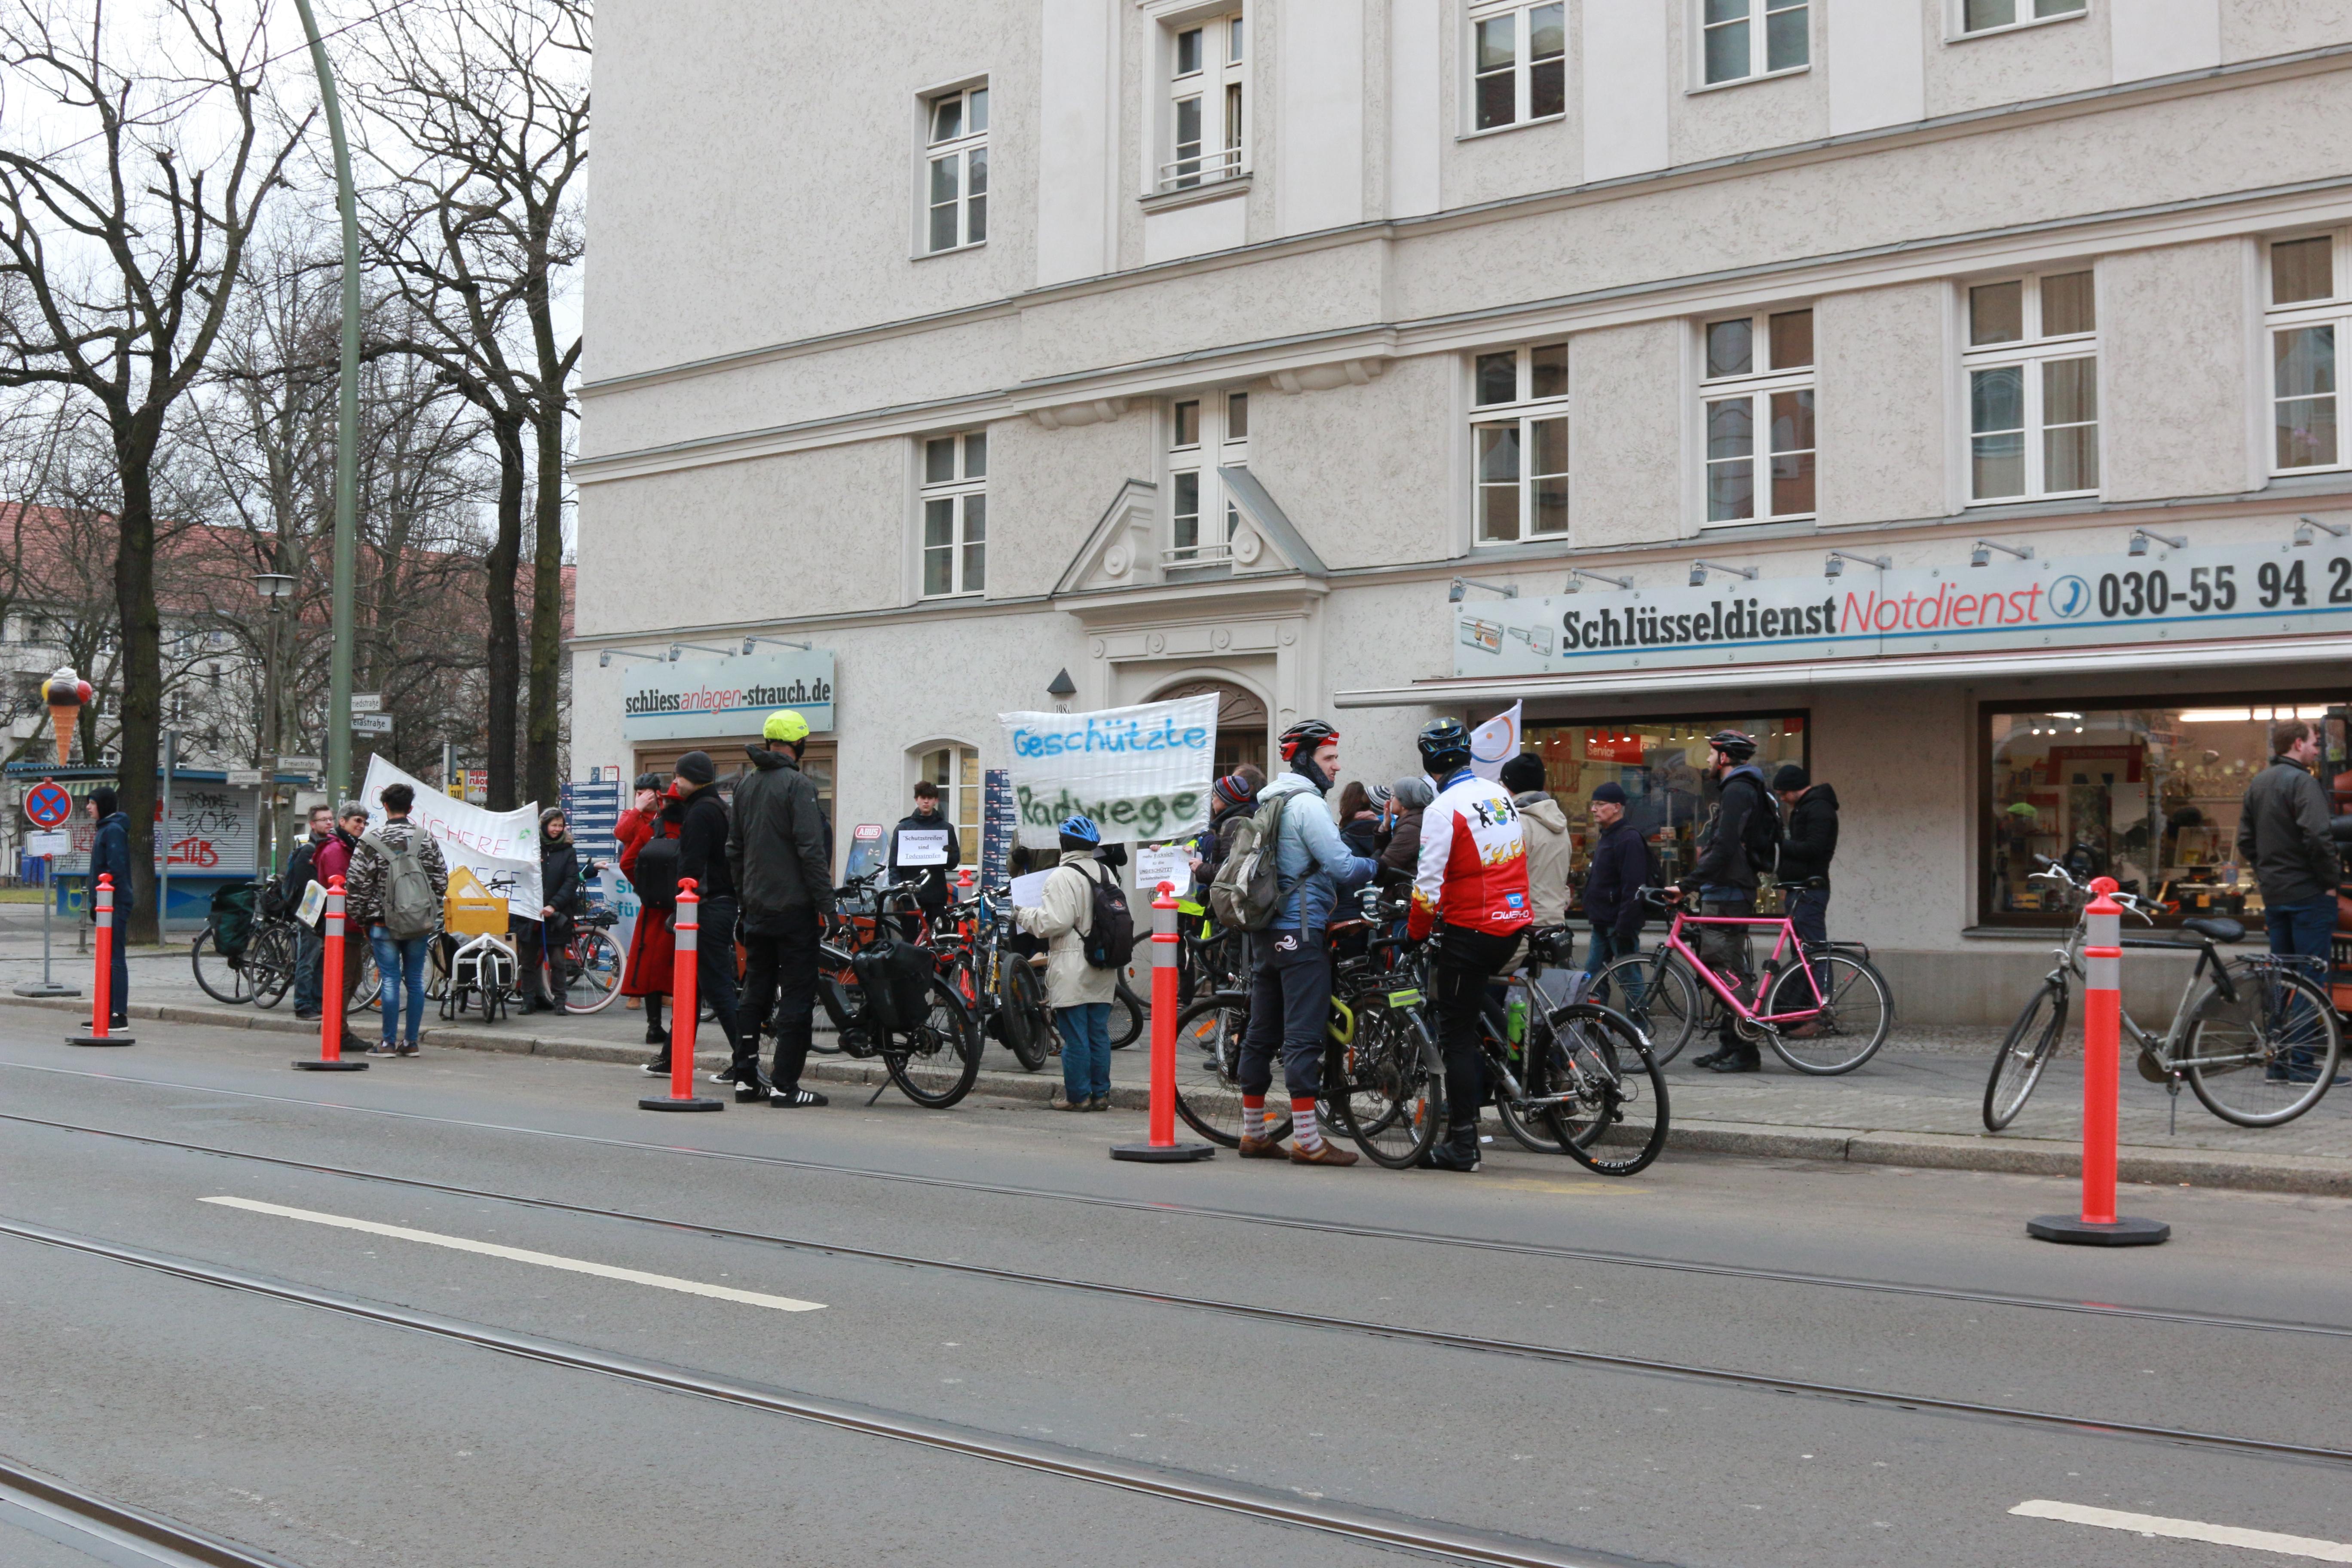 siegfriedstrasse_lichtenberg_pbl_IMG_2321